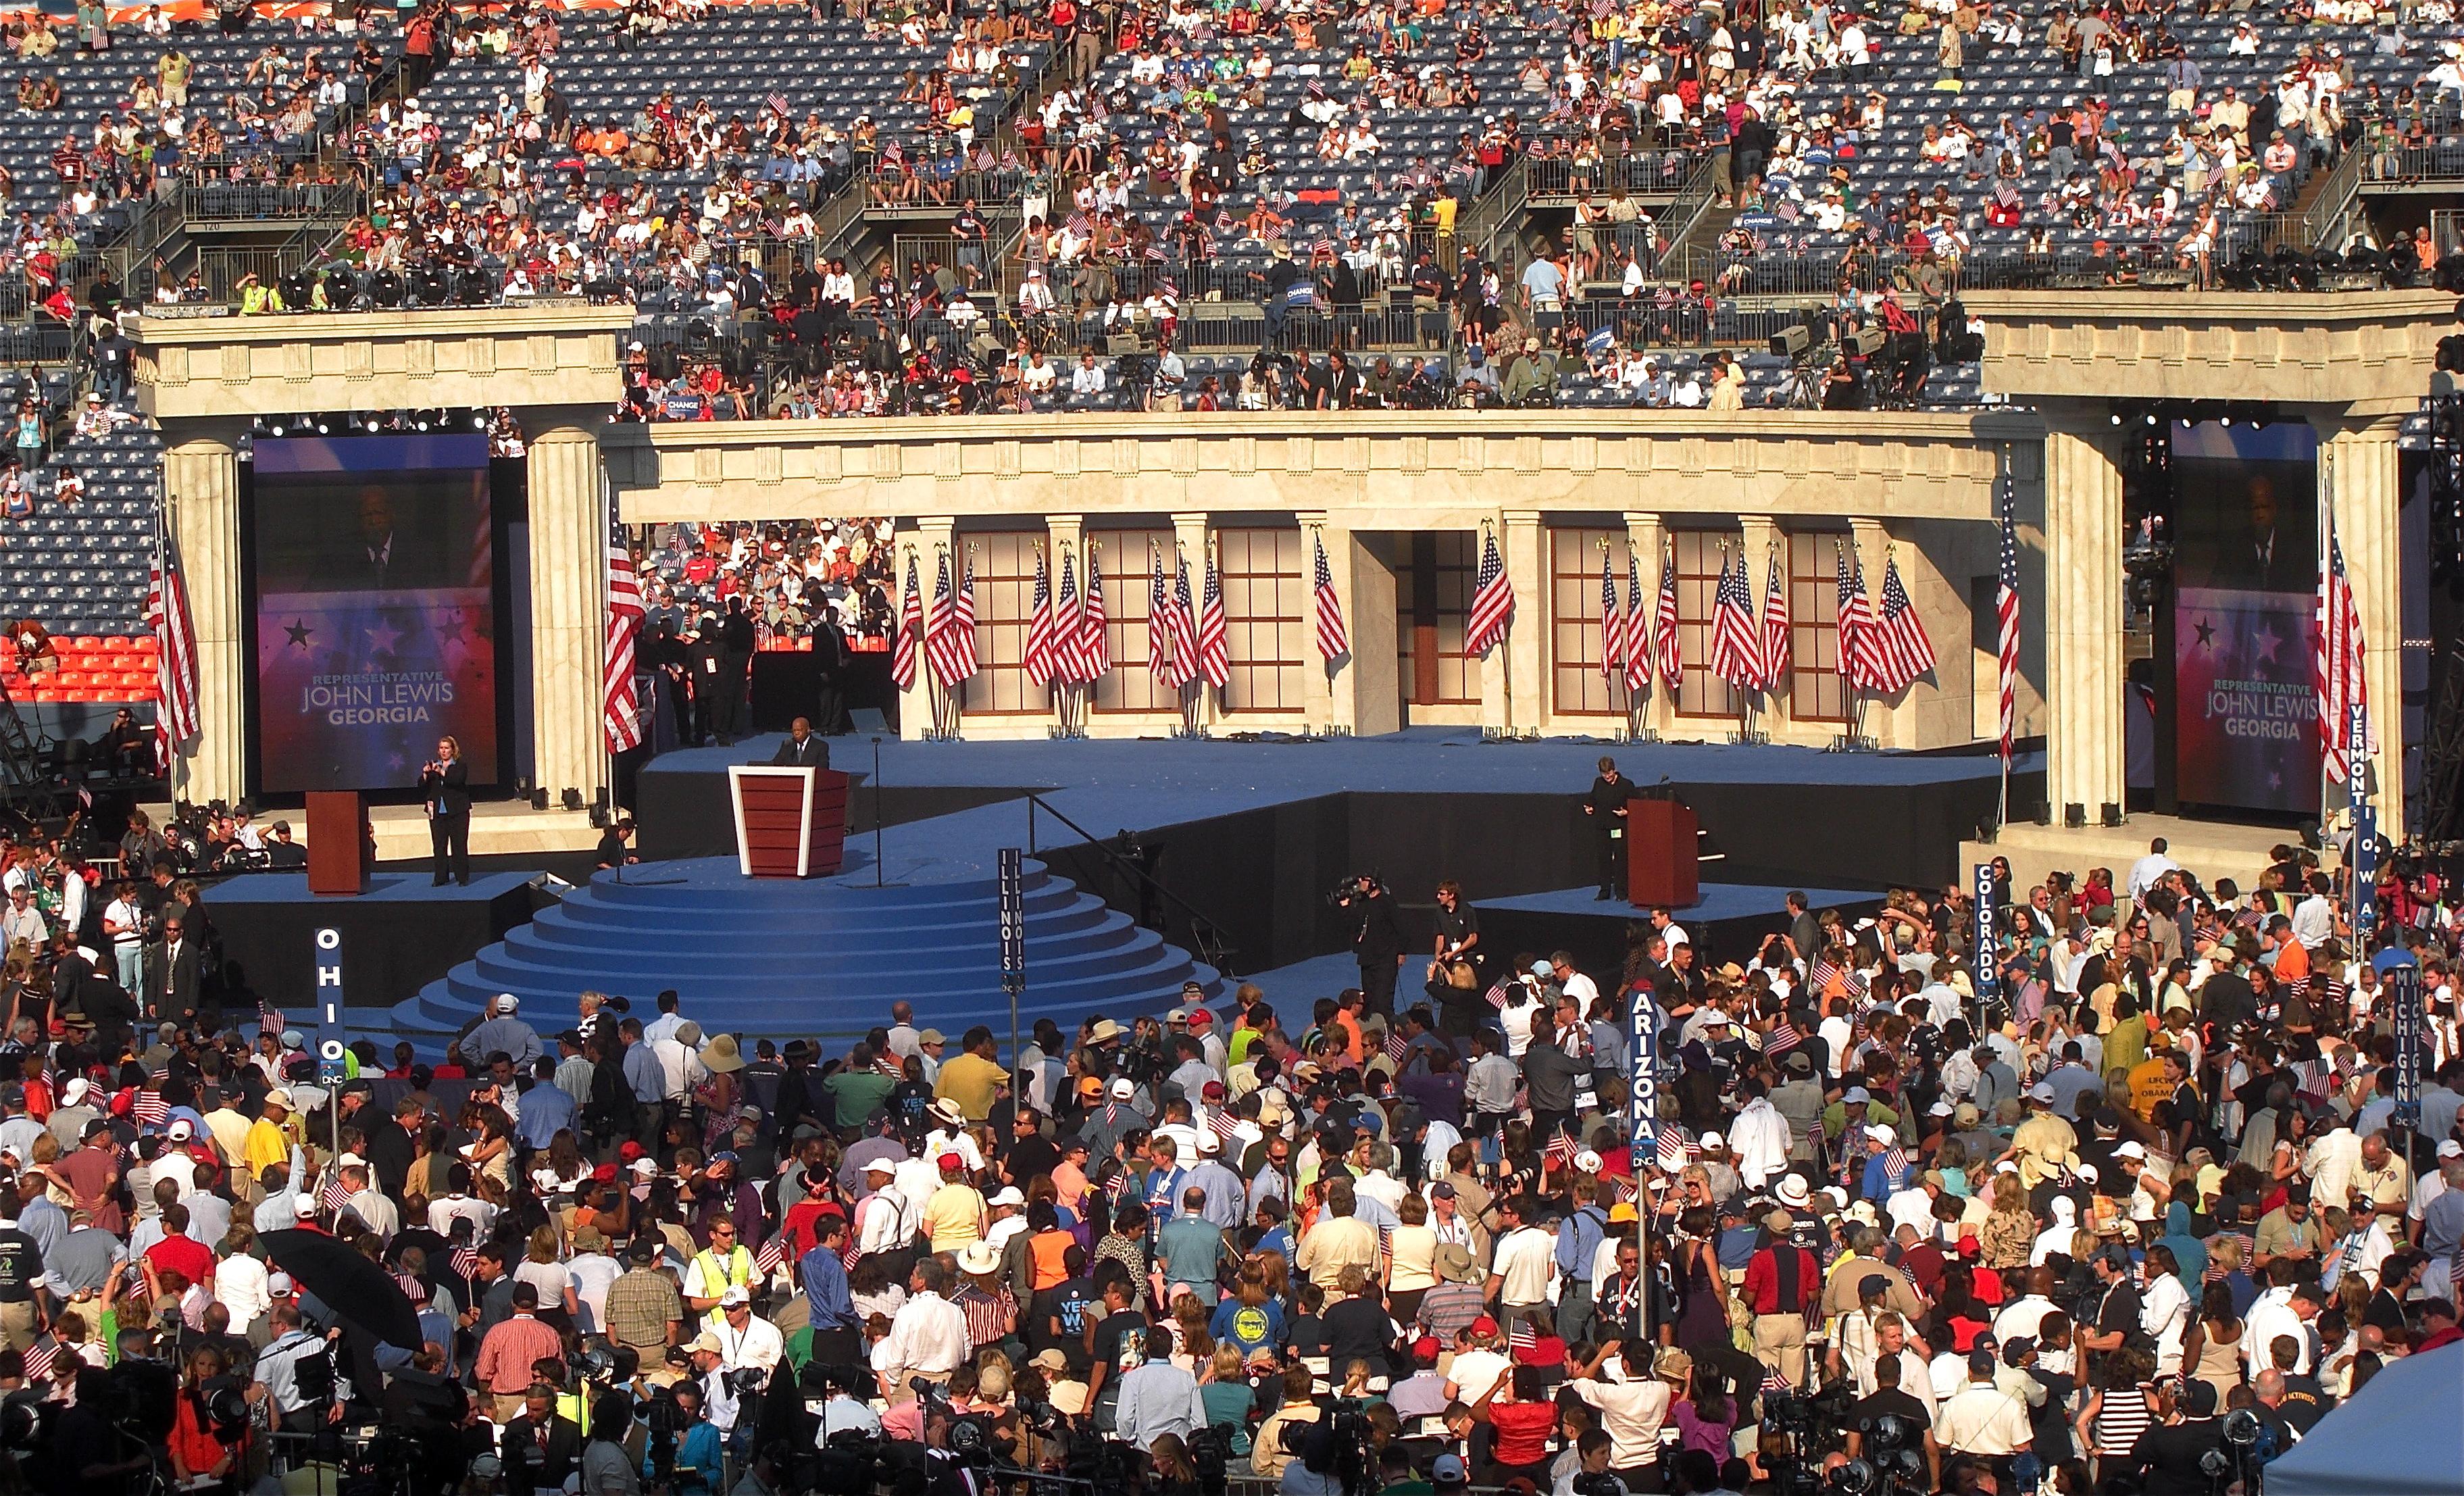 Democratic convention 2008